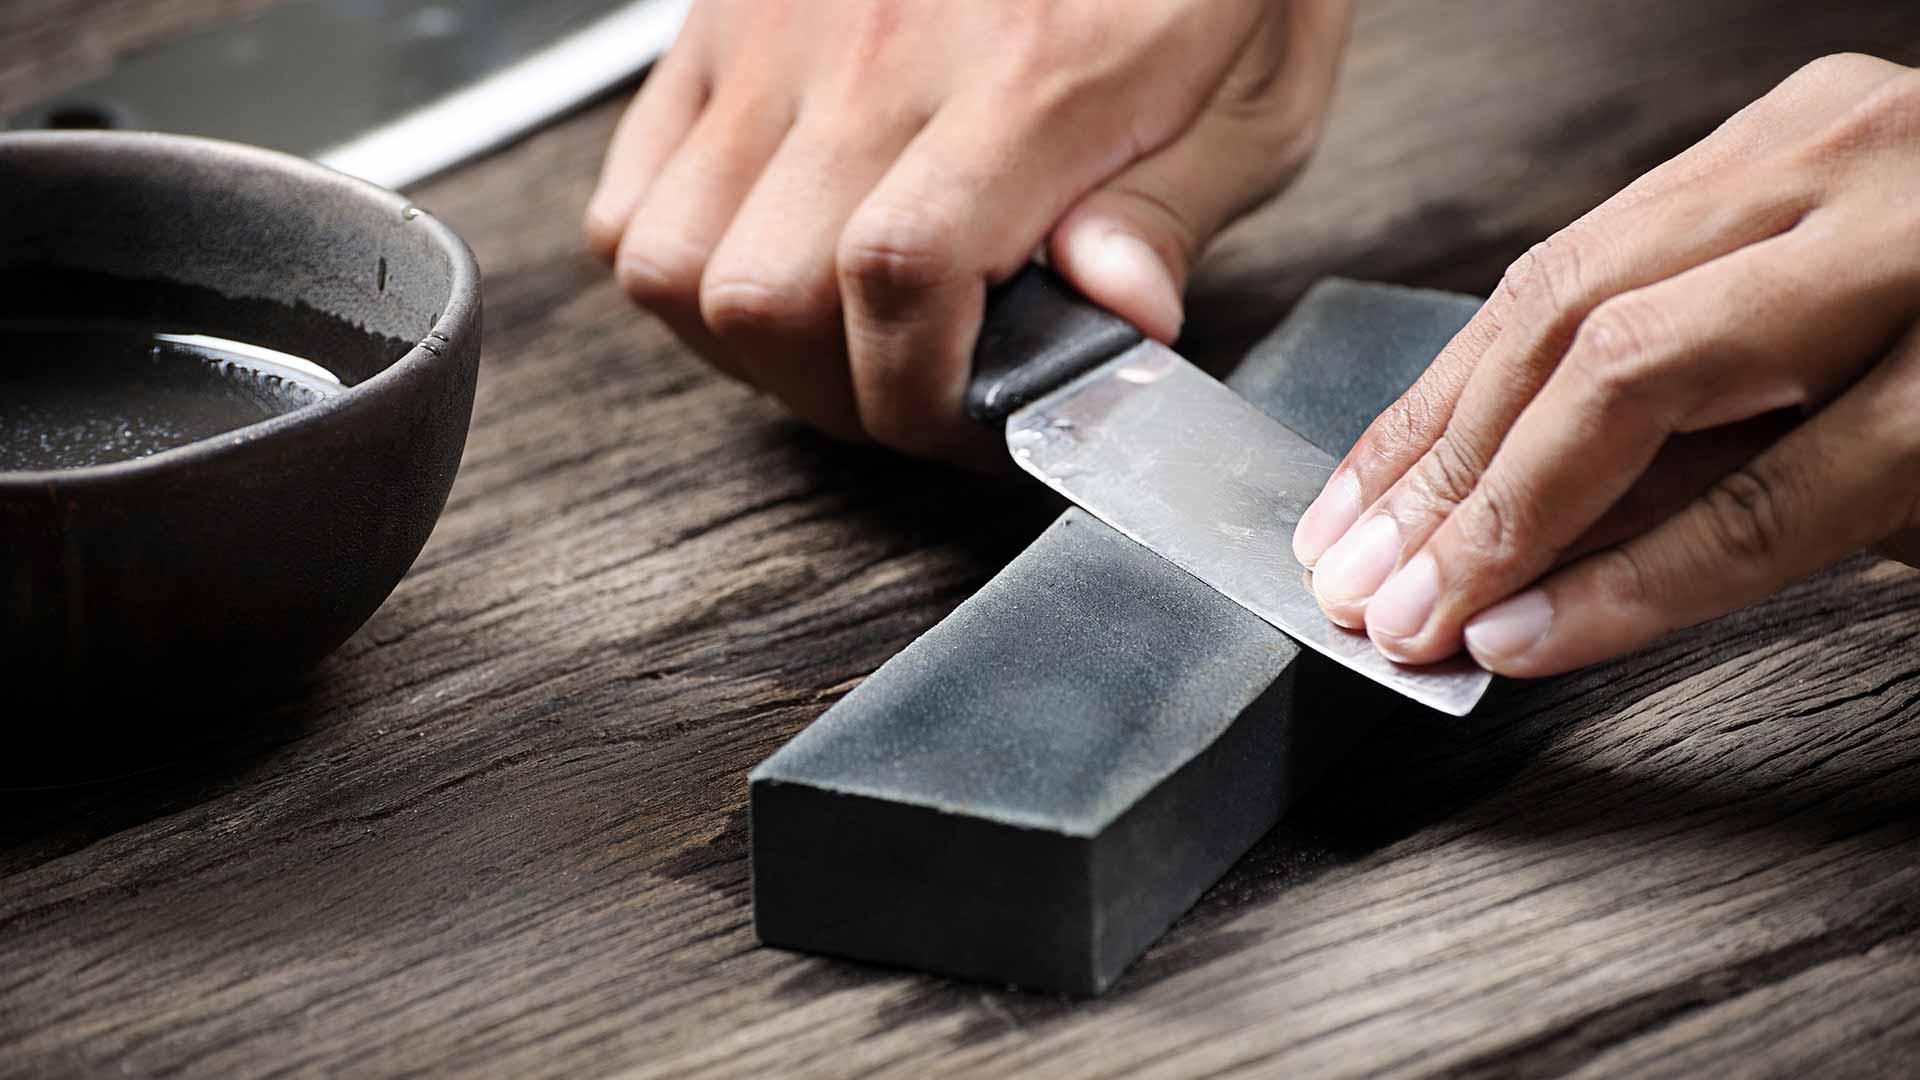 Anleitung zum Messerschärfen